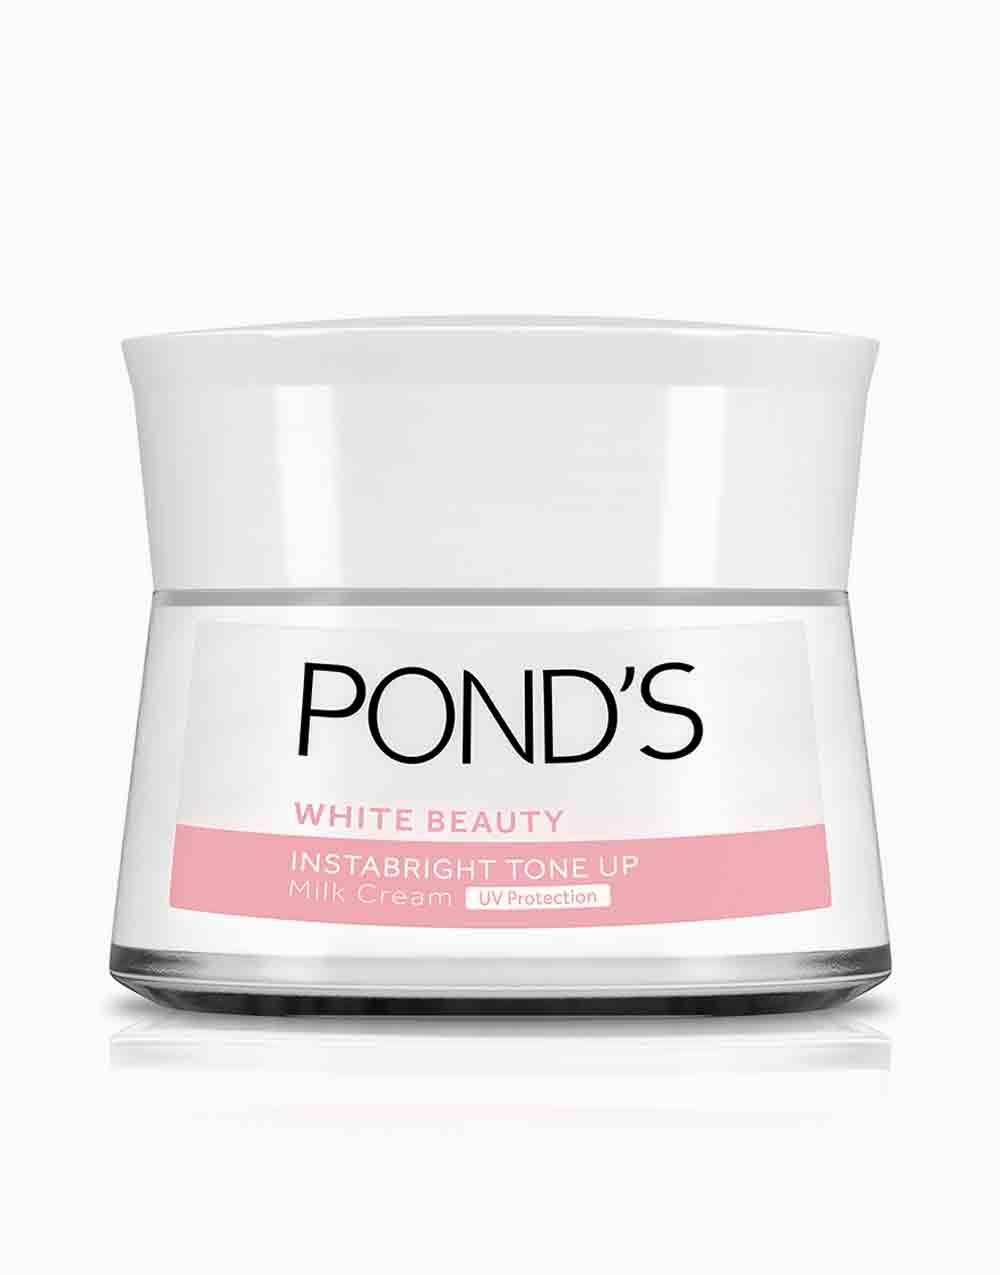 Pond's White Beauty Tone Up Milk Cream Jar by Pond's